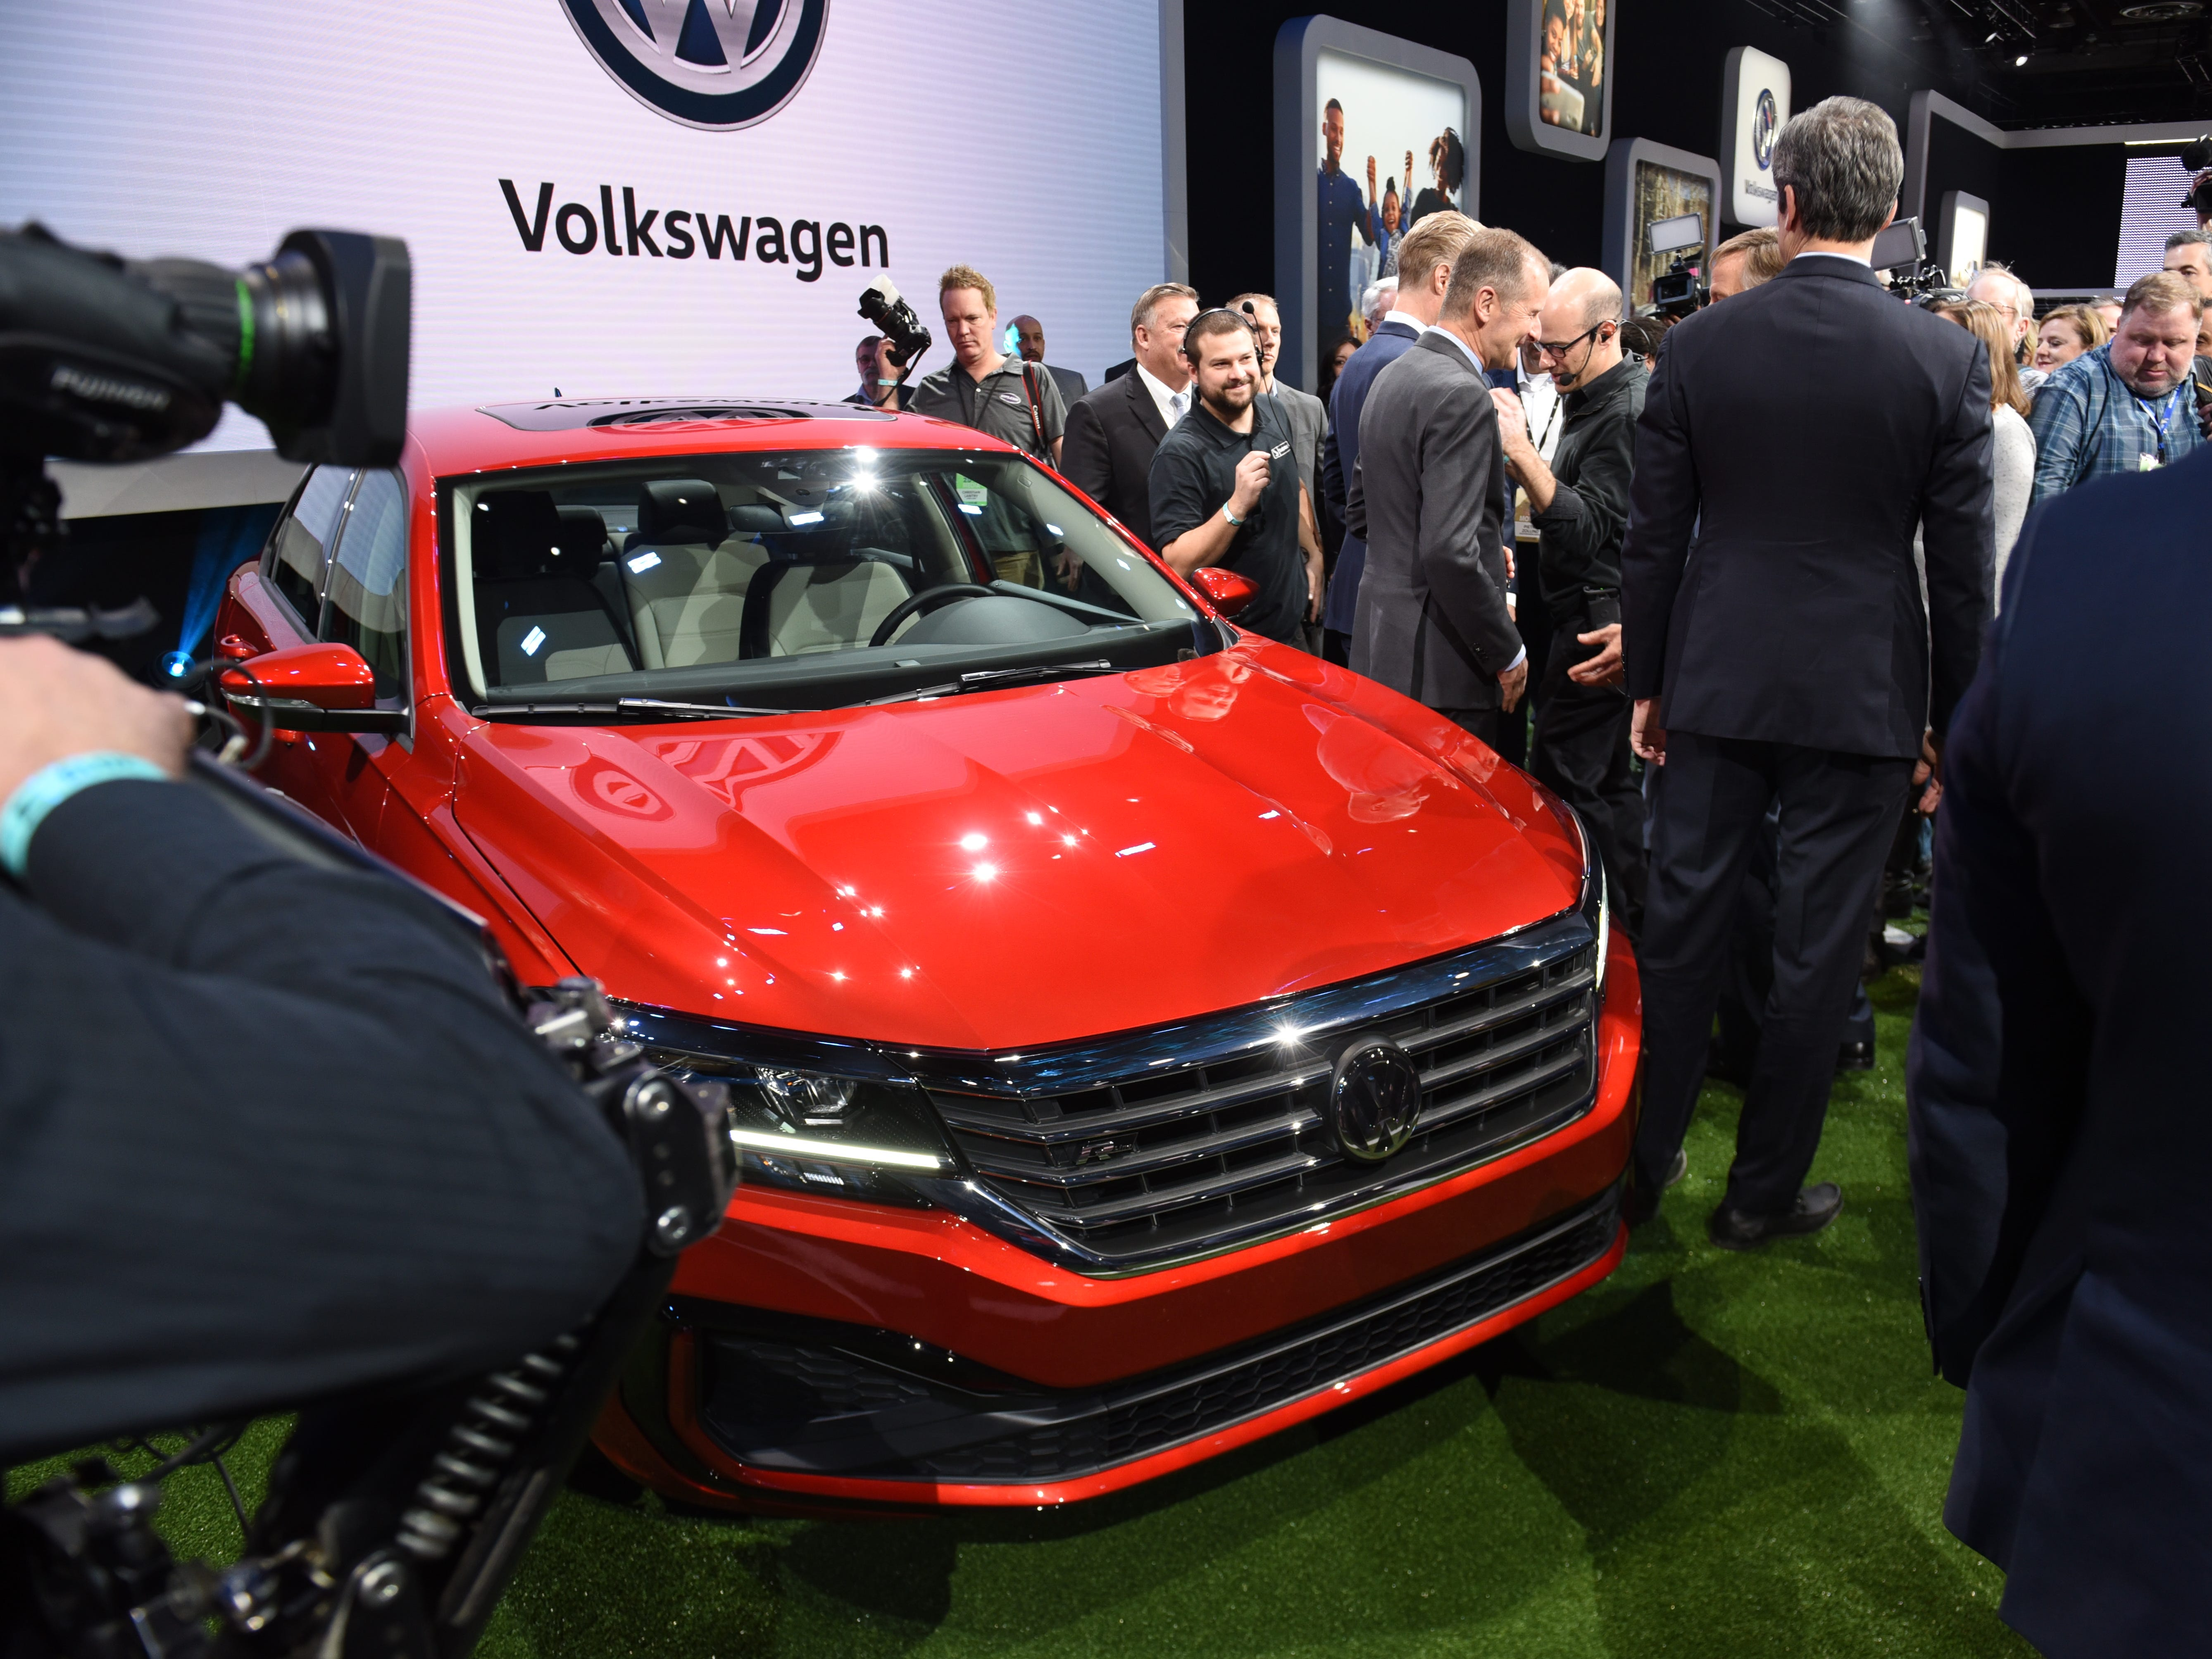 Journalist surround the 2020 Volkswagen Passat after its unveiling.